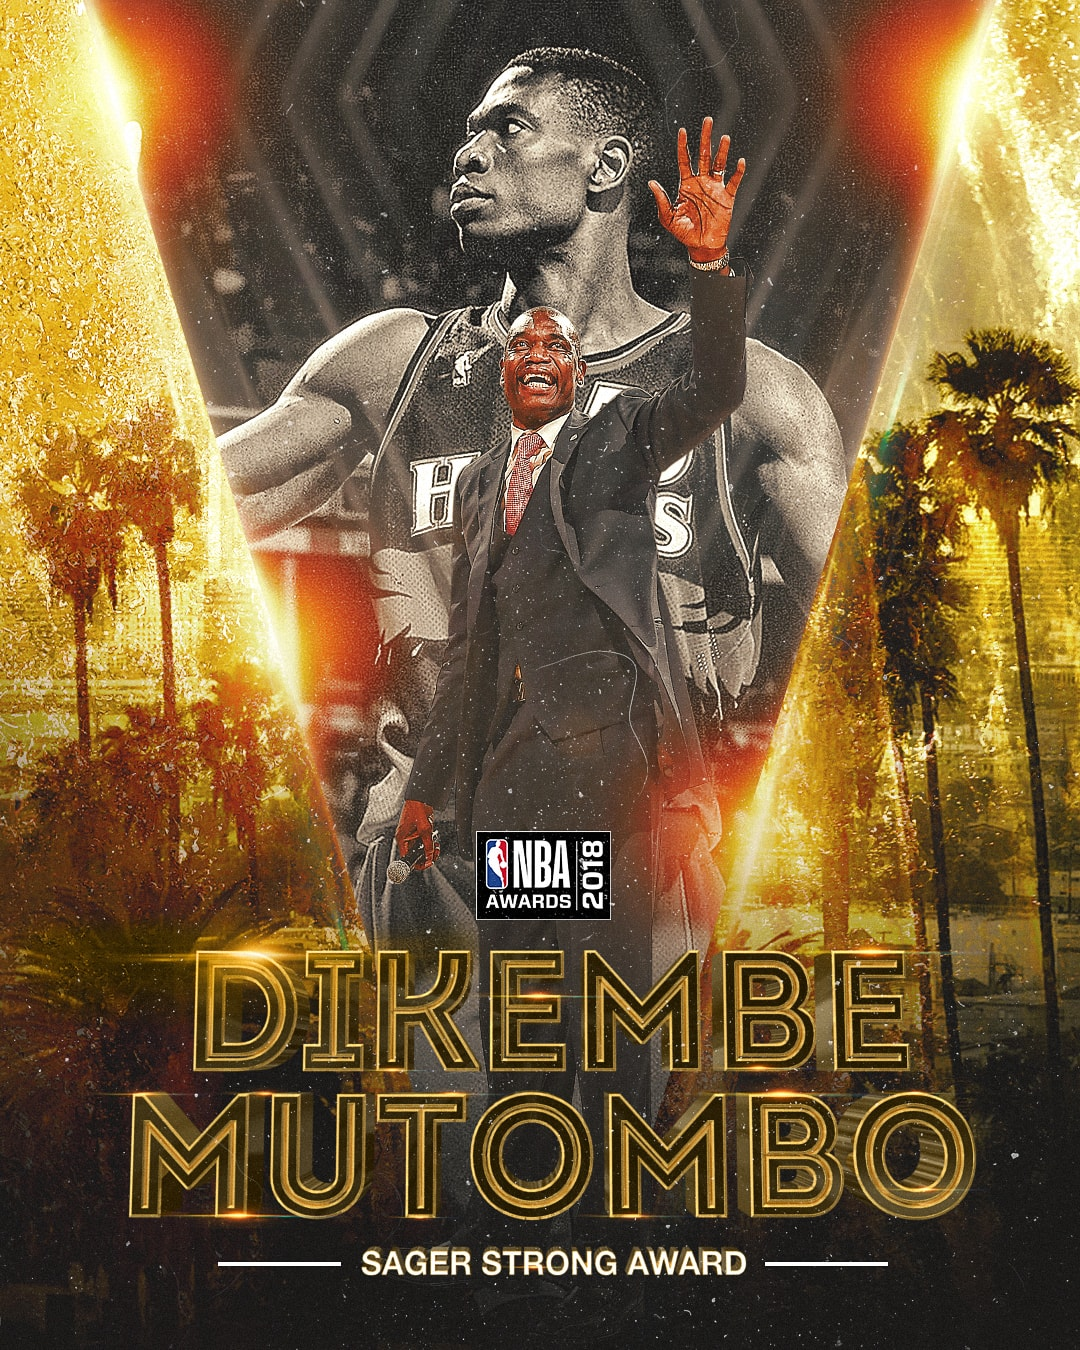 2018 NBA Awards Sager Strong Award Dikembe Mutombo